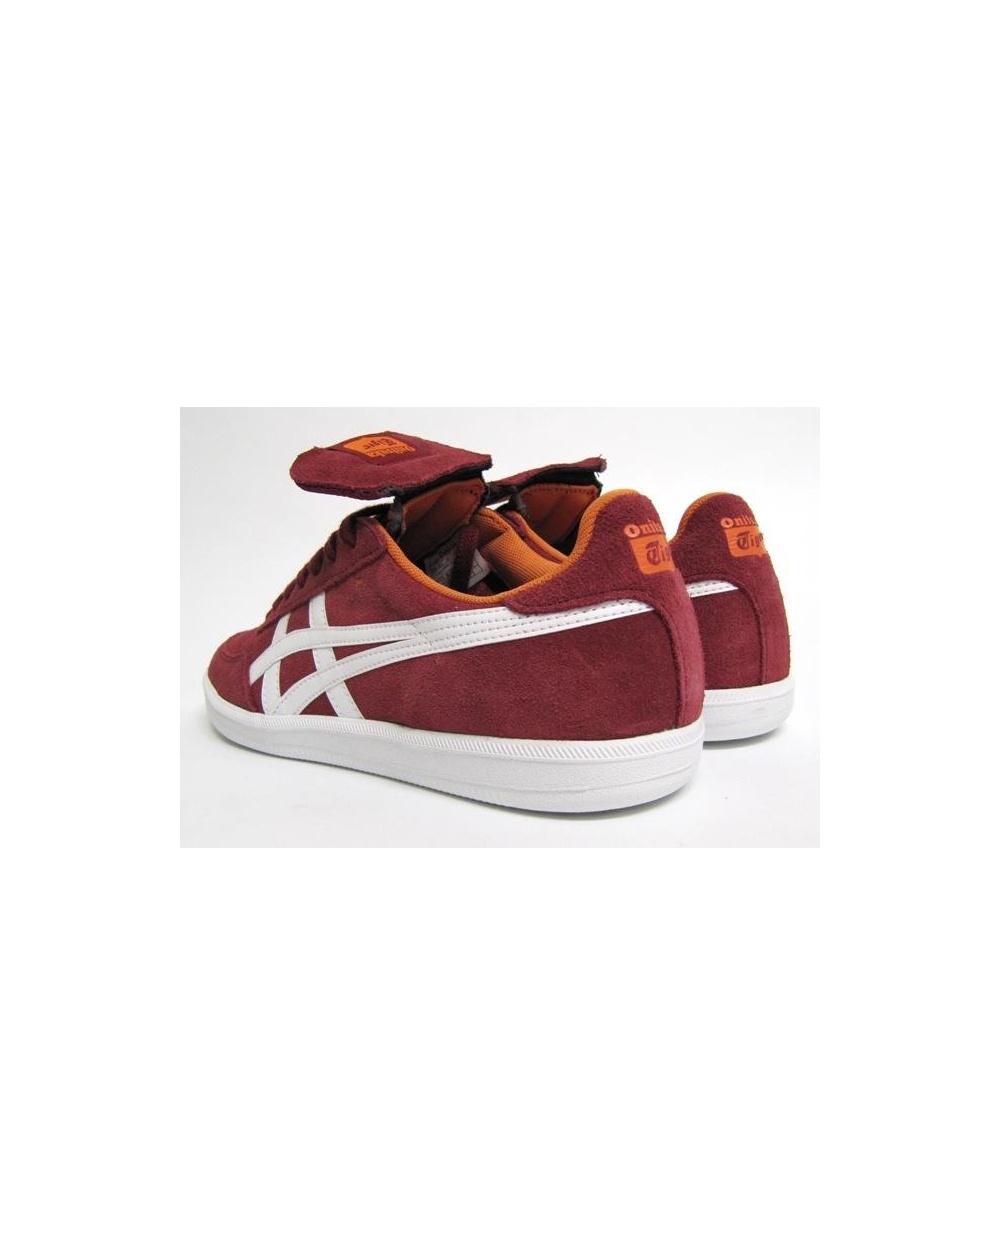 sports shoes b2832 52628 Onitsuka Tiger Hulse Trainers Burgundy/white